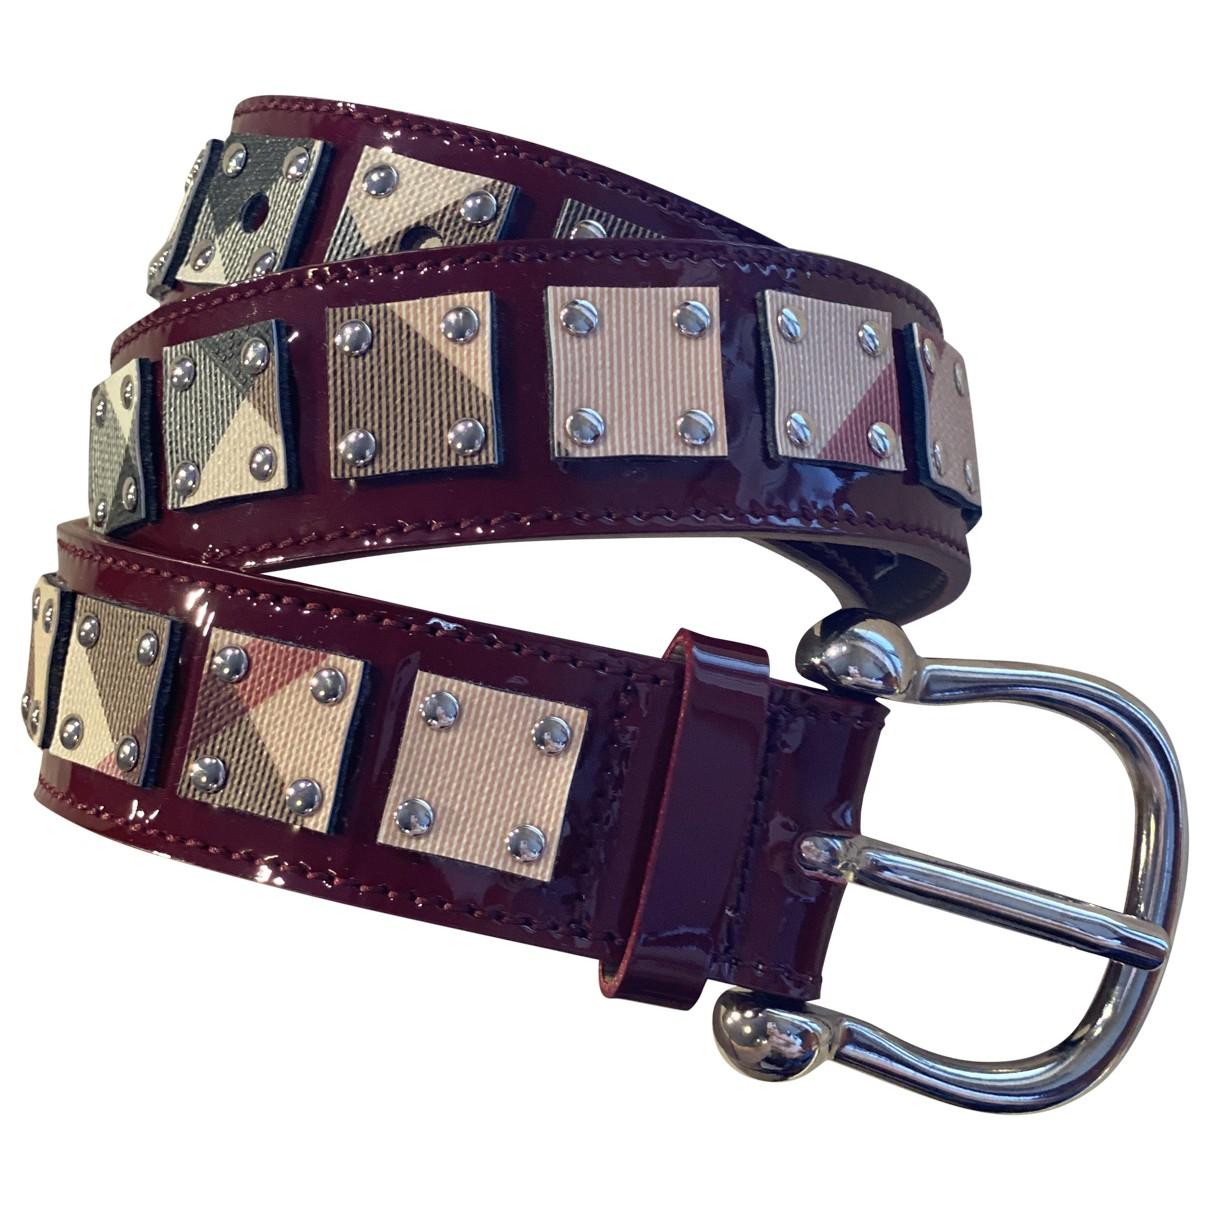 Burberry \N Burgundy Patent leather belt for Women 80 cm